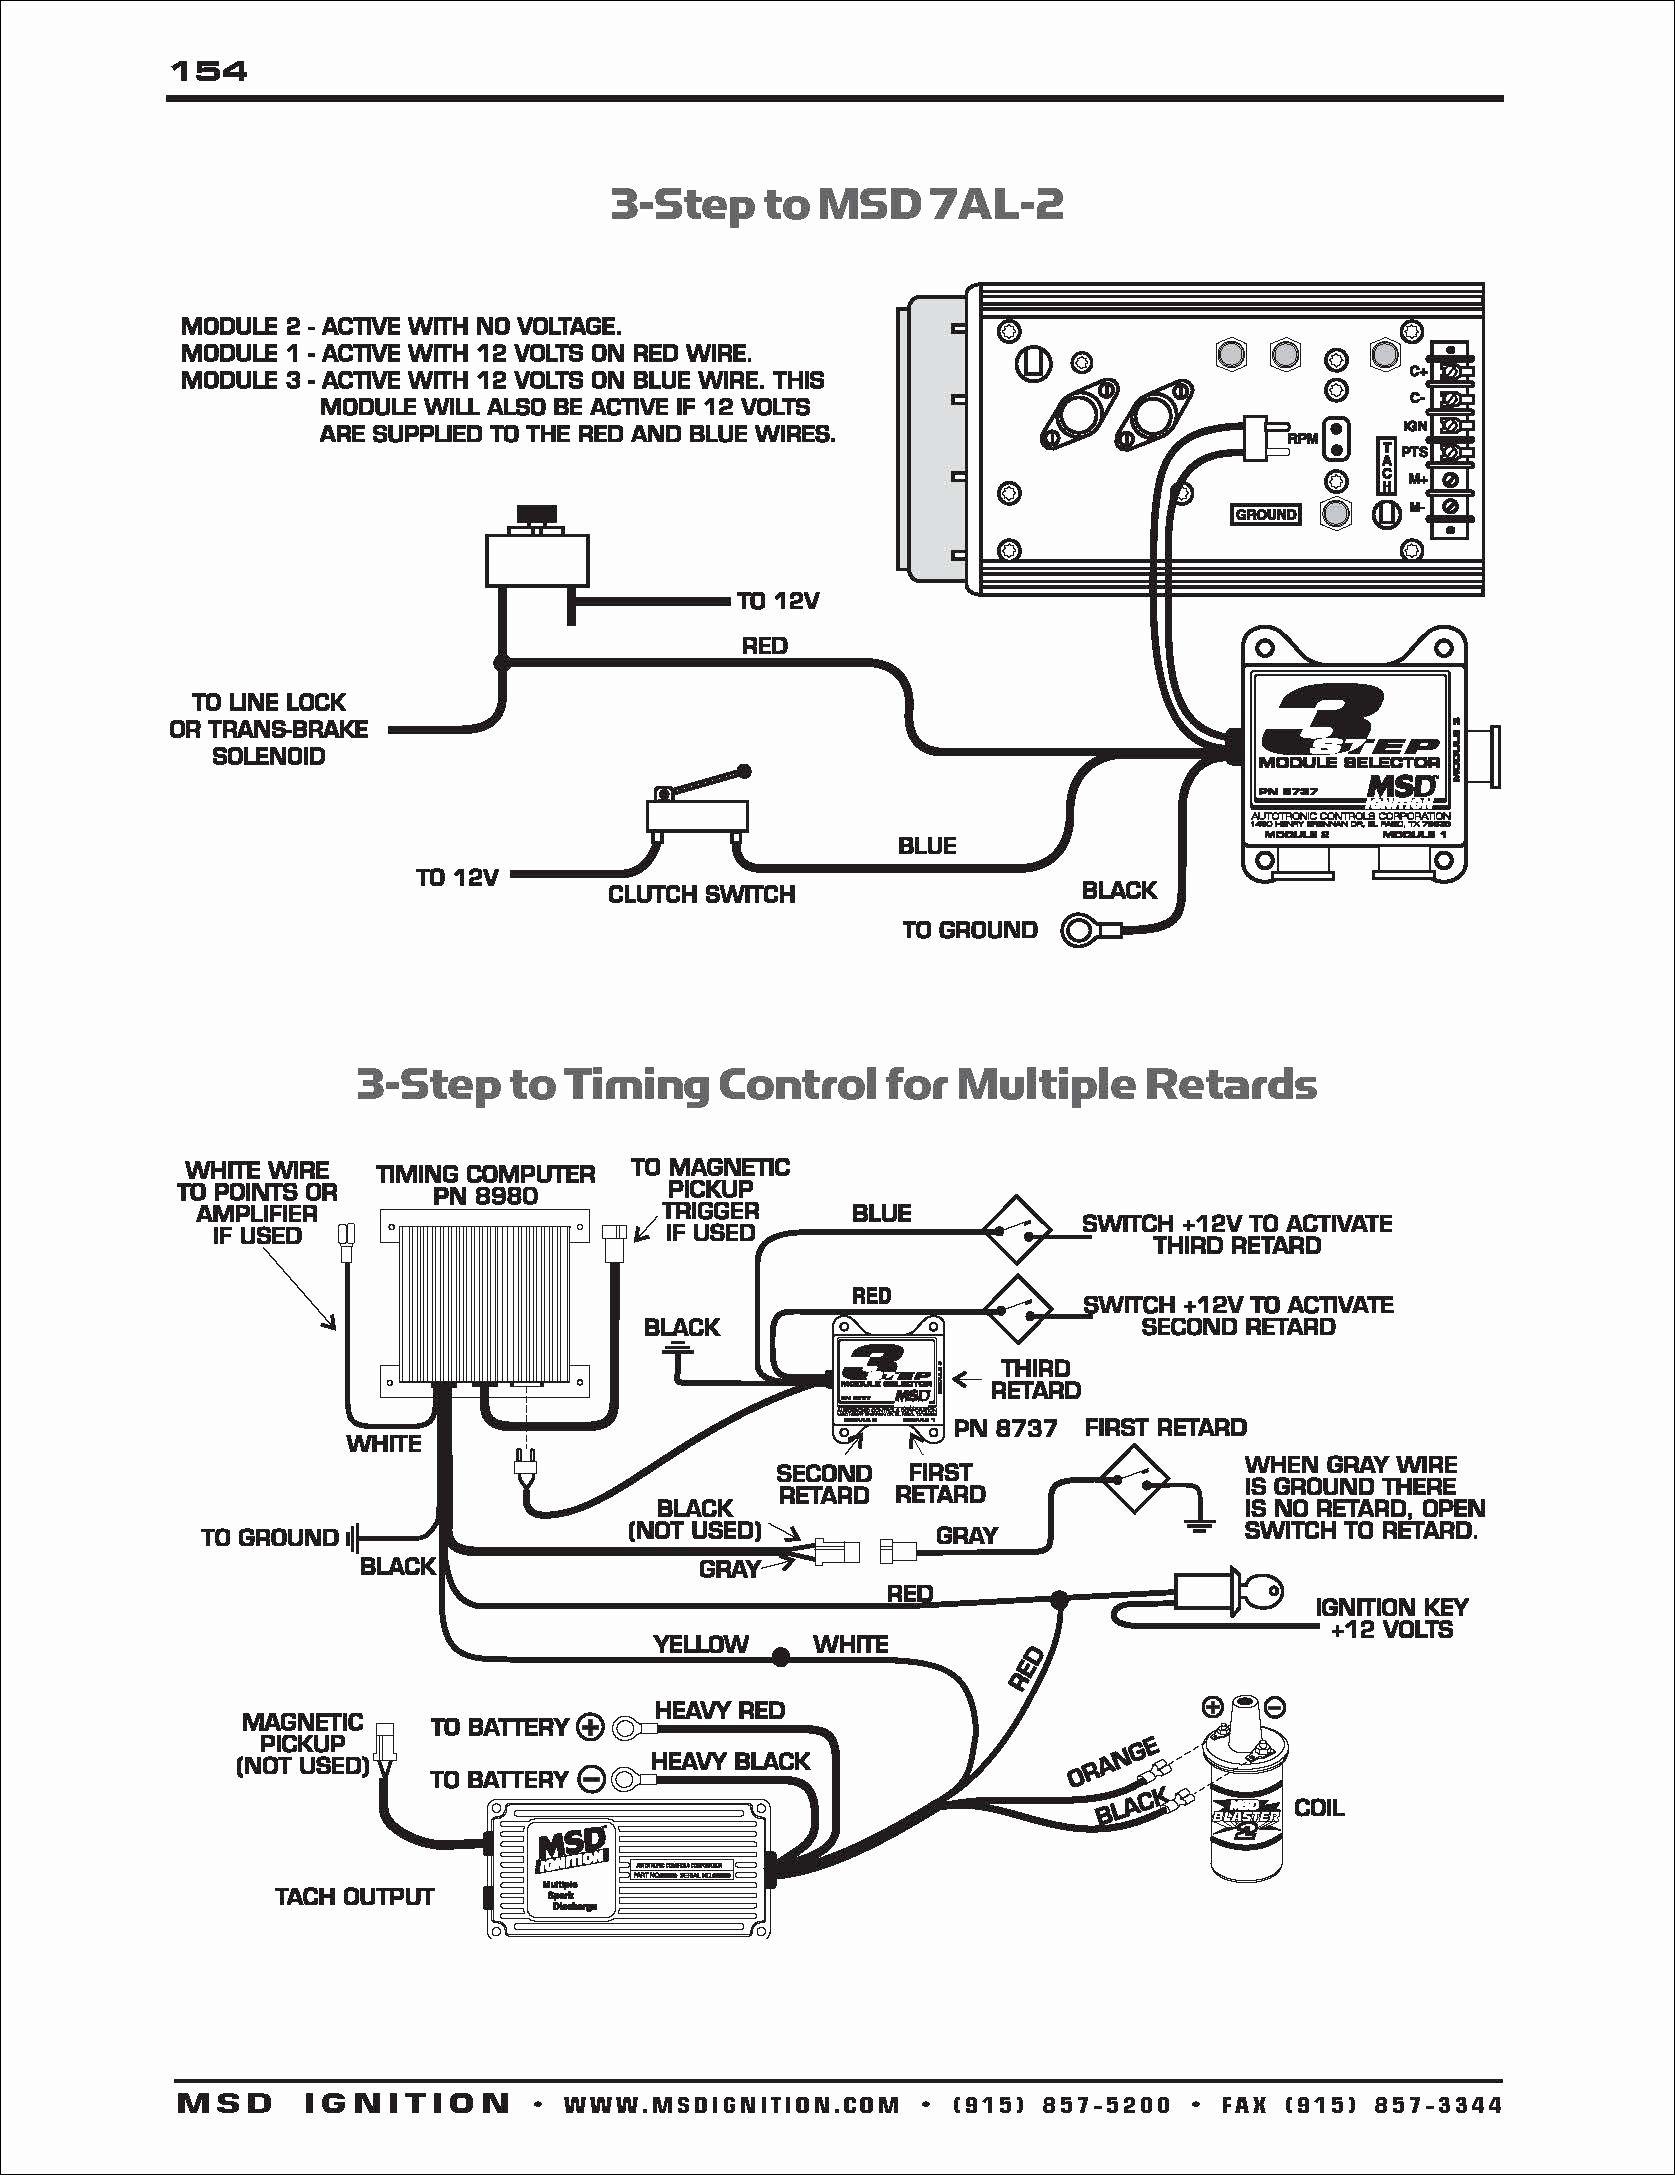 John Deere Wiring Diagram Download Luxury John Deere Ignition Switch - John Deere Ignition Switch Wiring Diagram